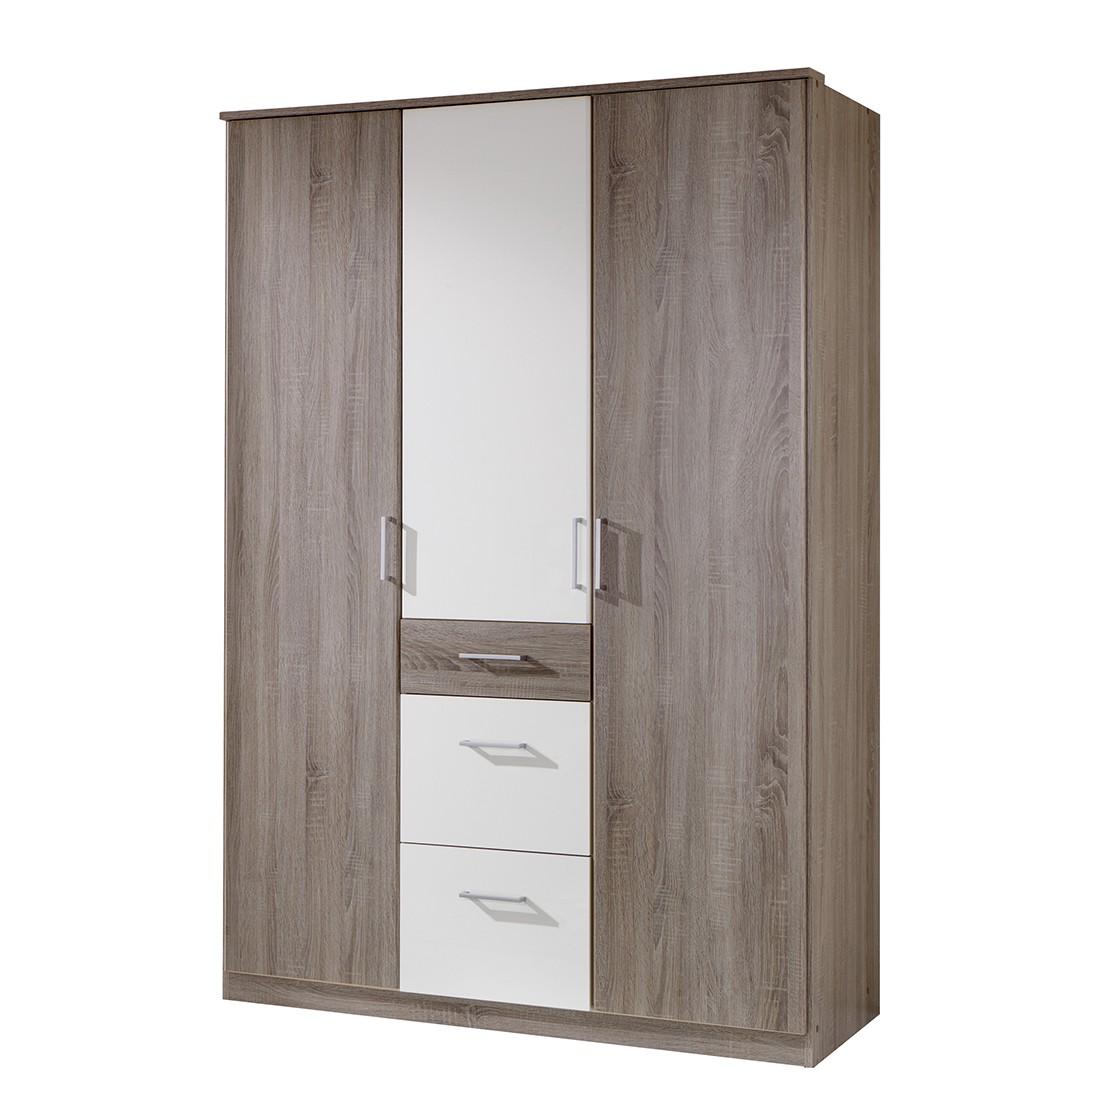 kommode jenny montana eiche lavafarbig wimex jetzt bestellen. Black Bedroom Furniture Sets. Home Design Ideas